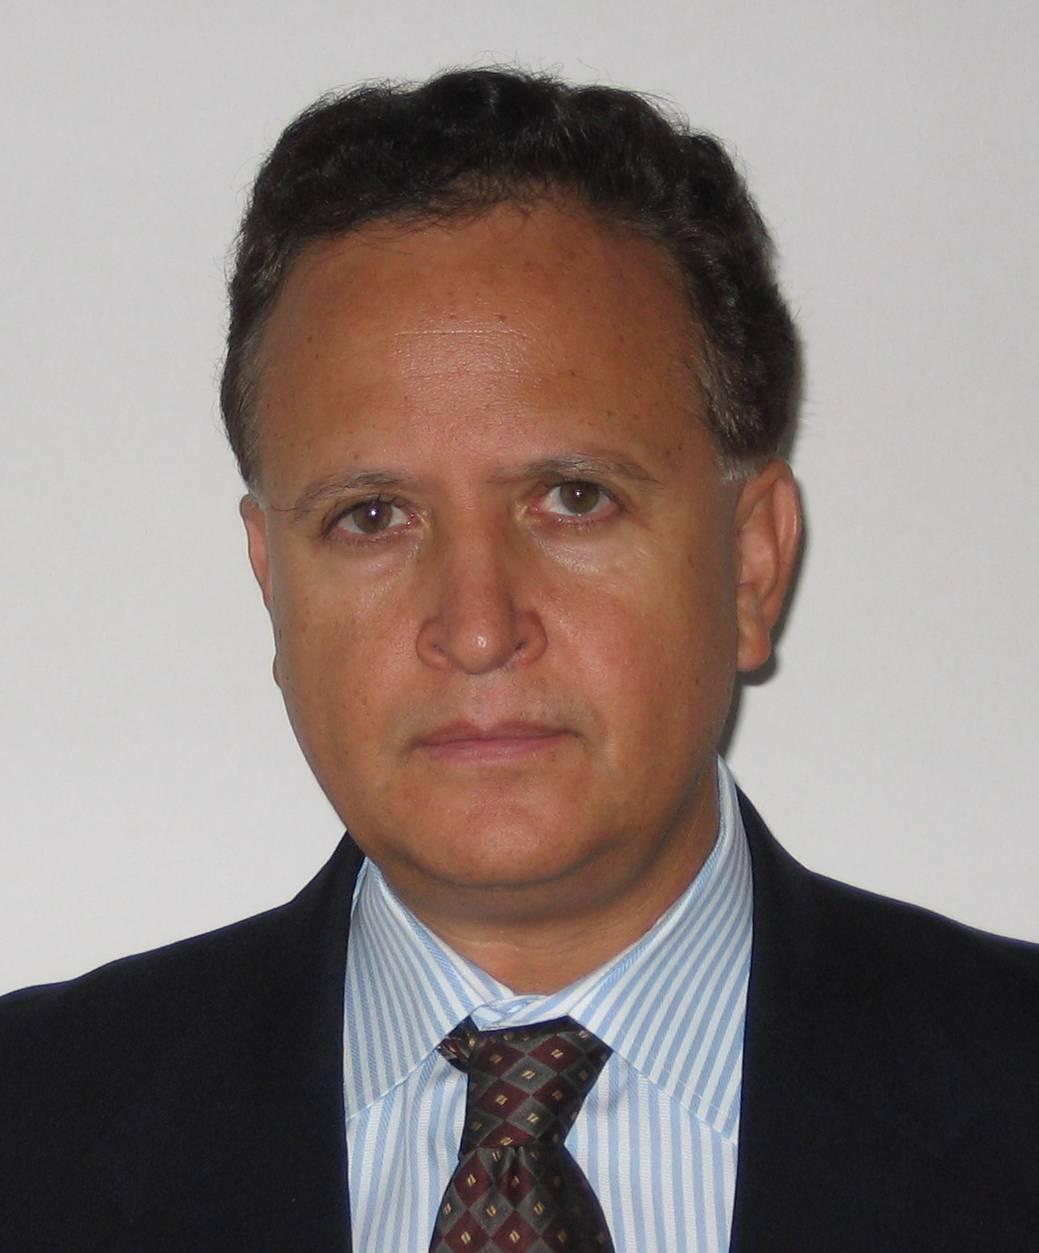 Ricardo Quiroga